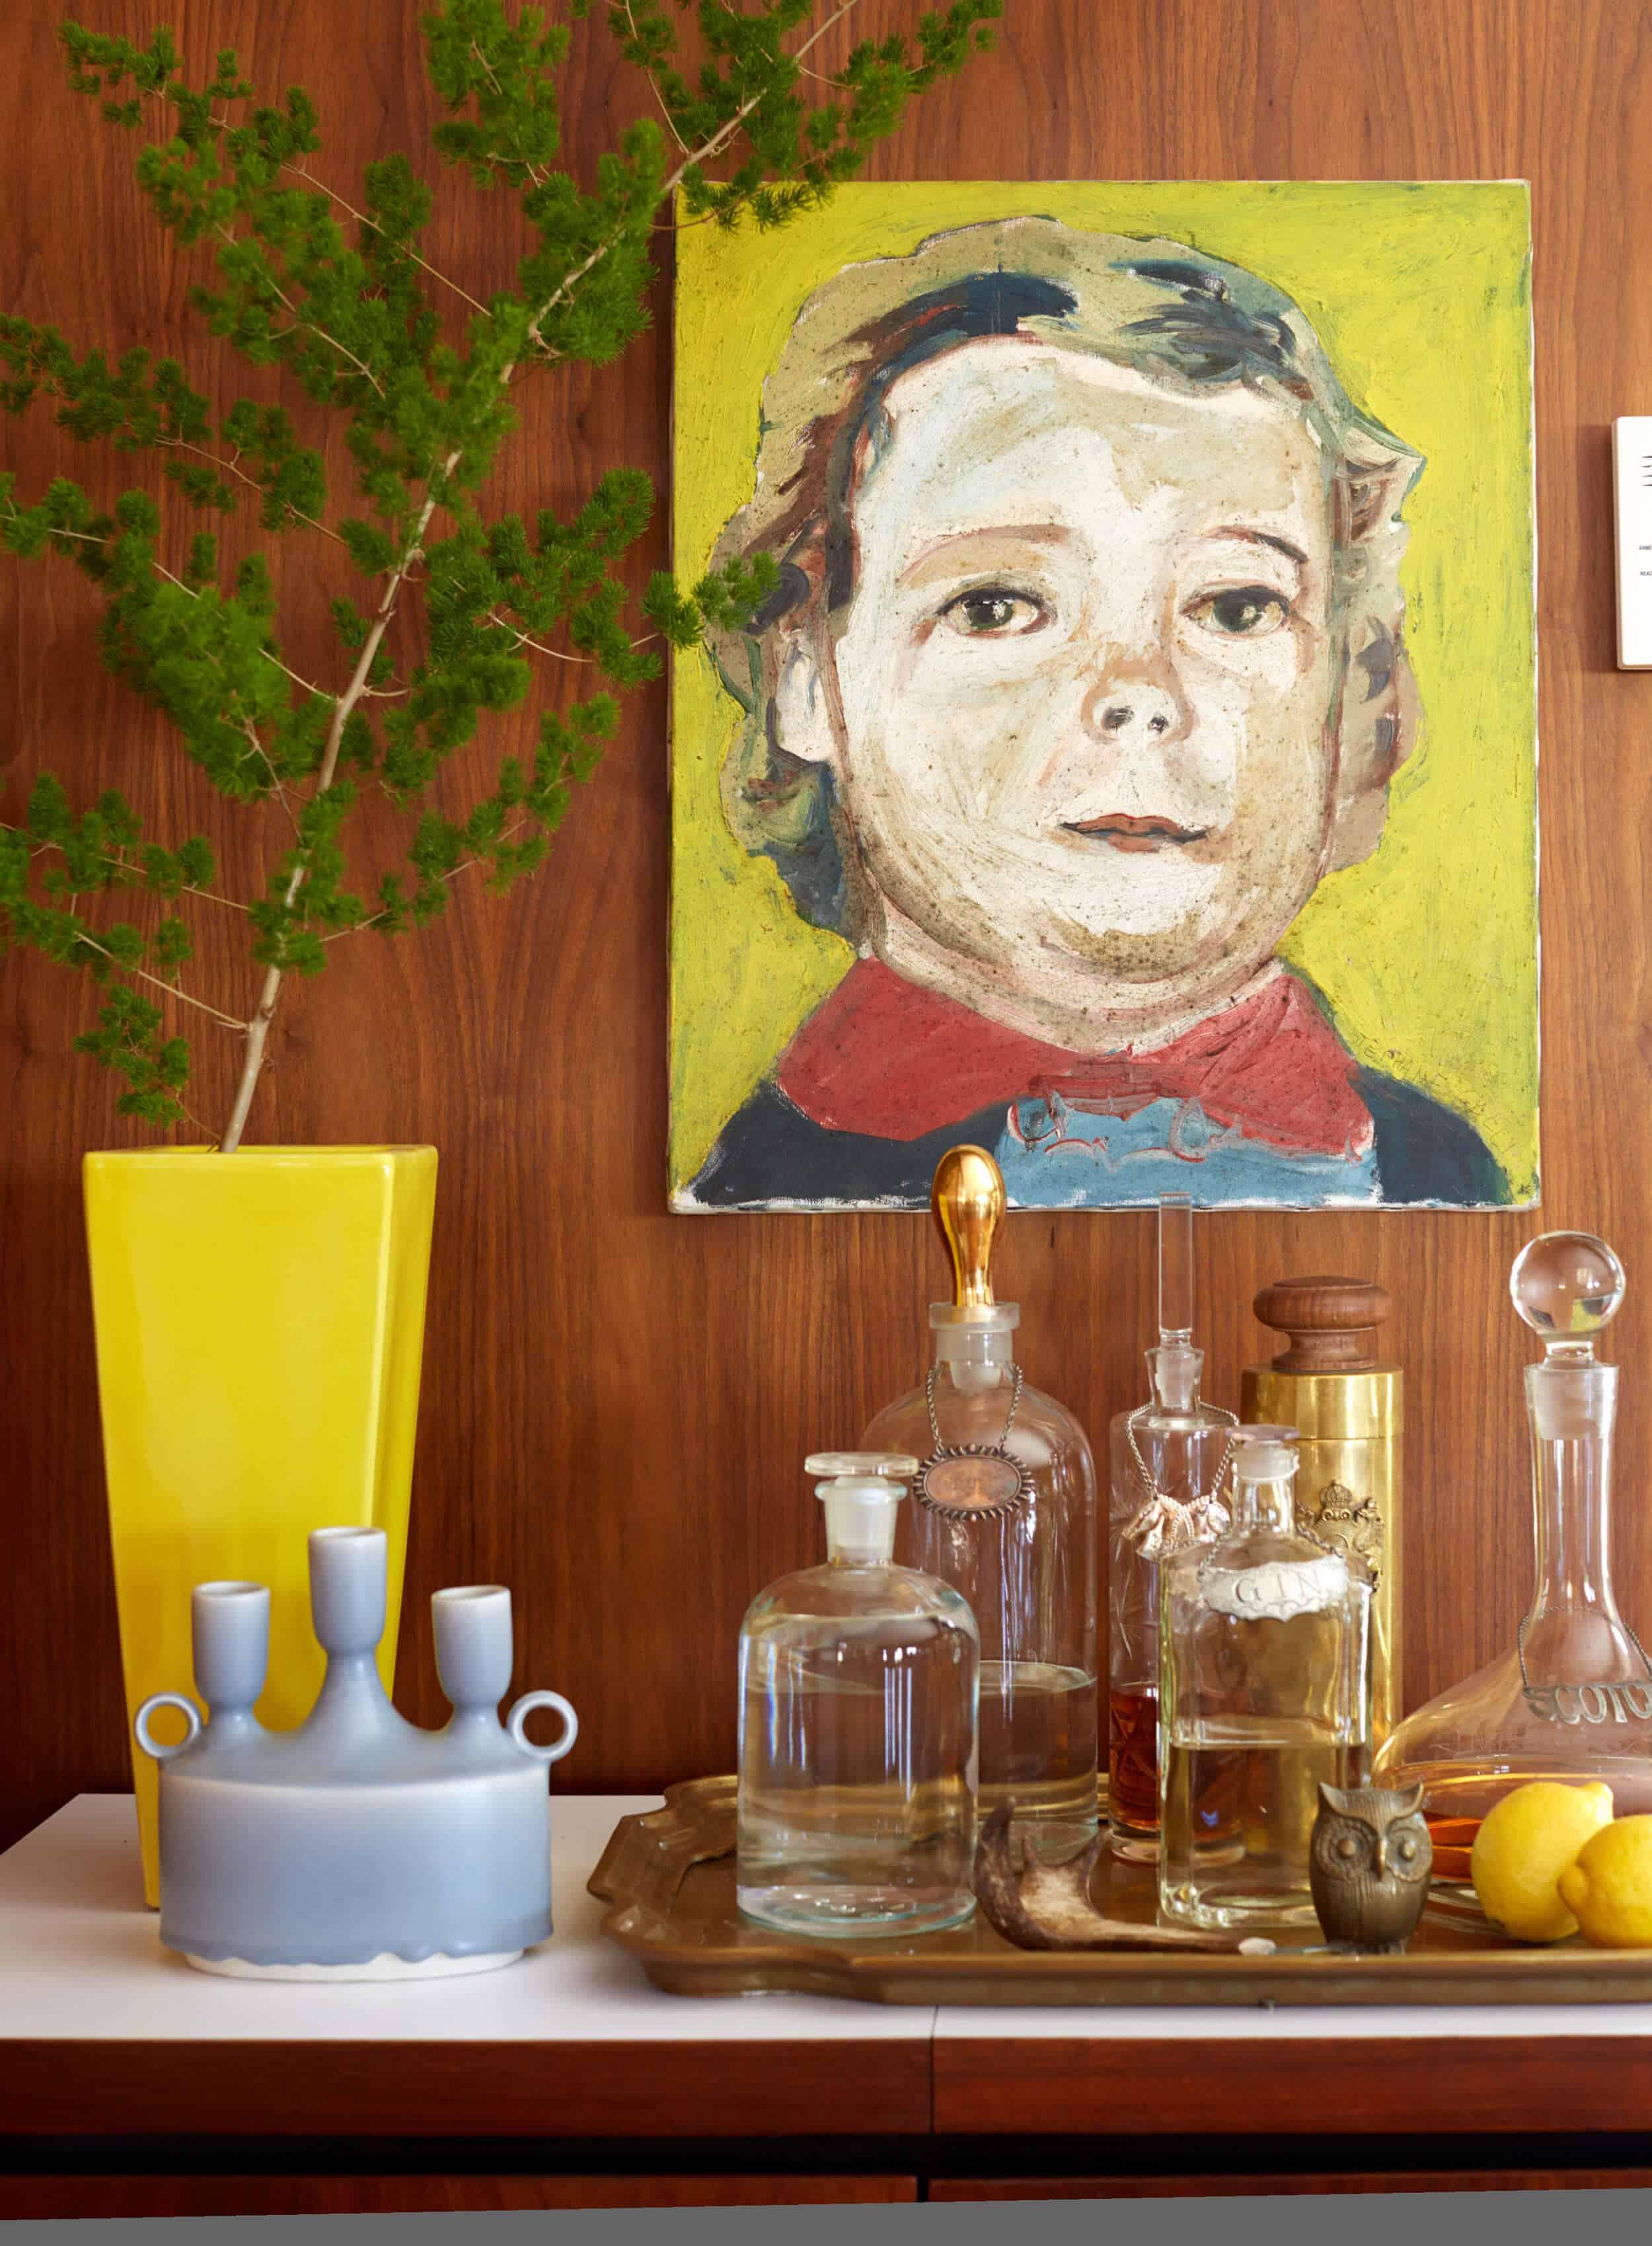 Emily Henderson Living Room Dining Room Bedroom Bathroom Office Tray Combos 21